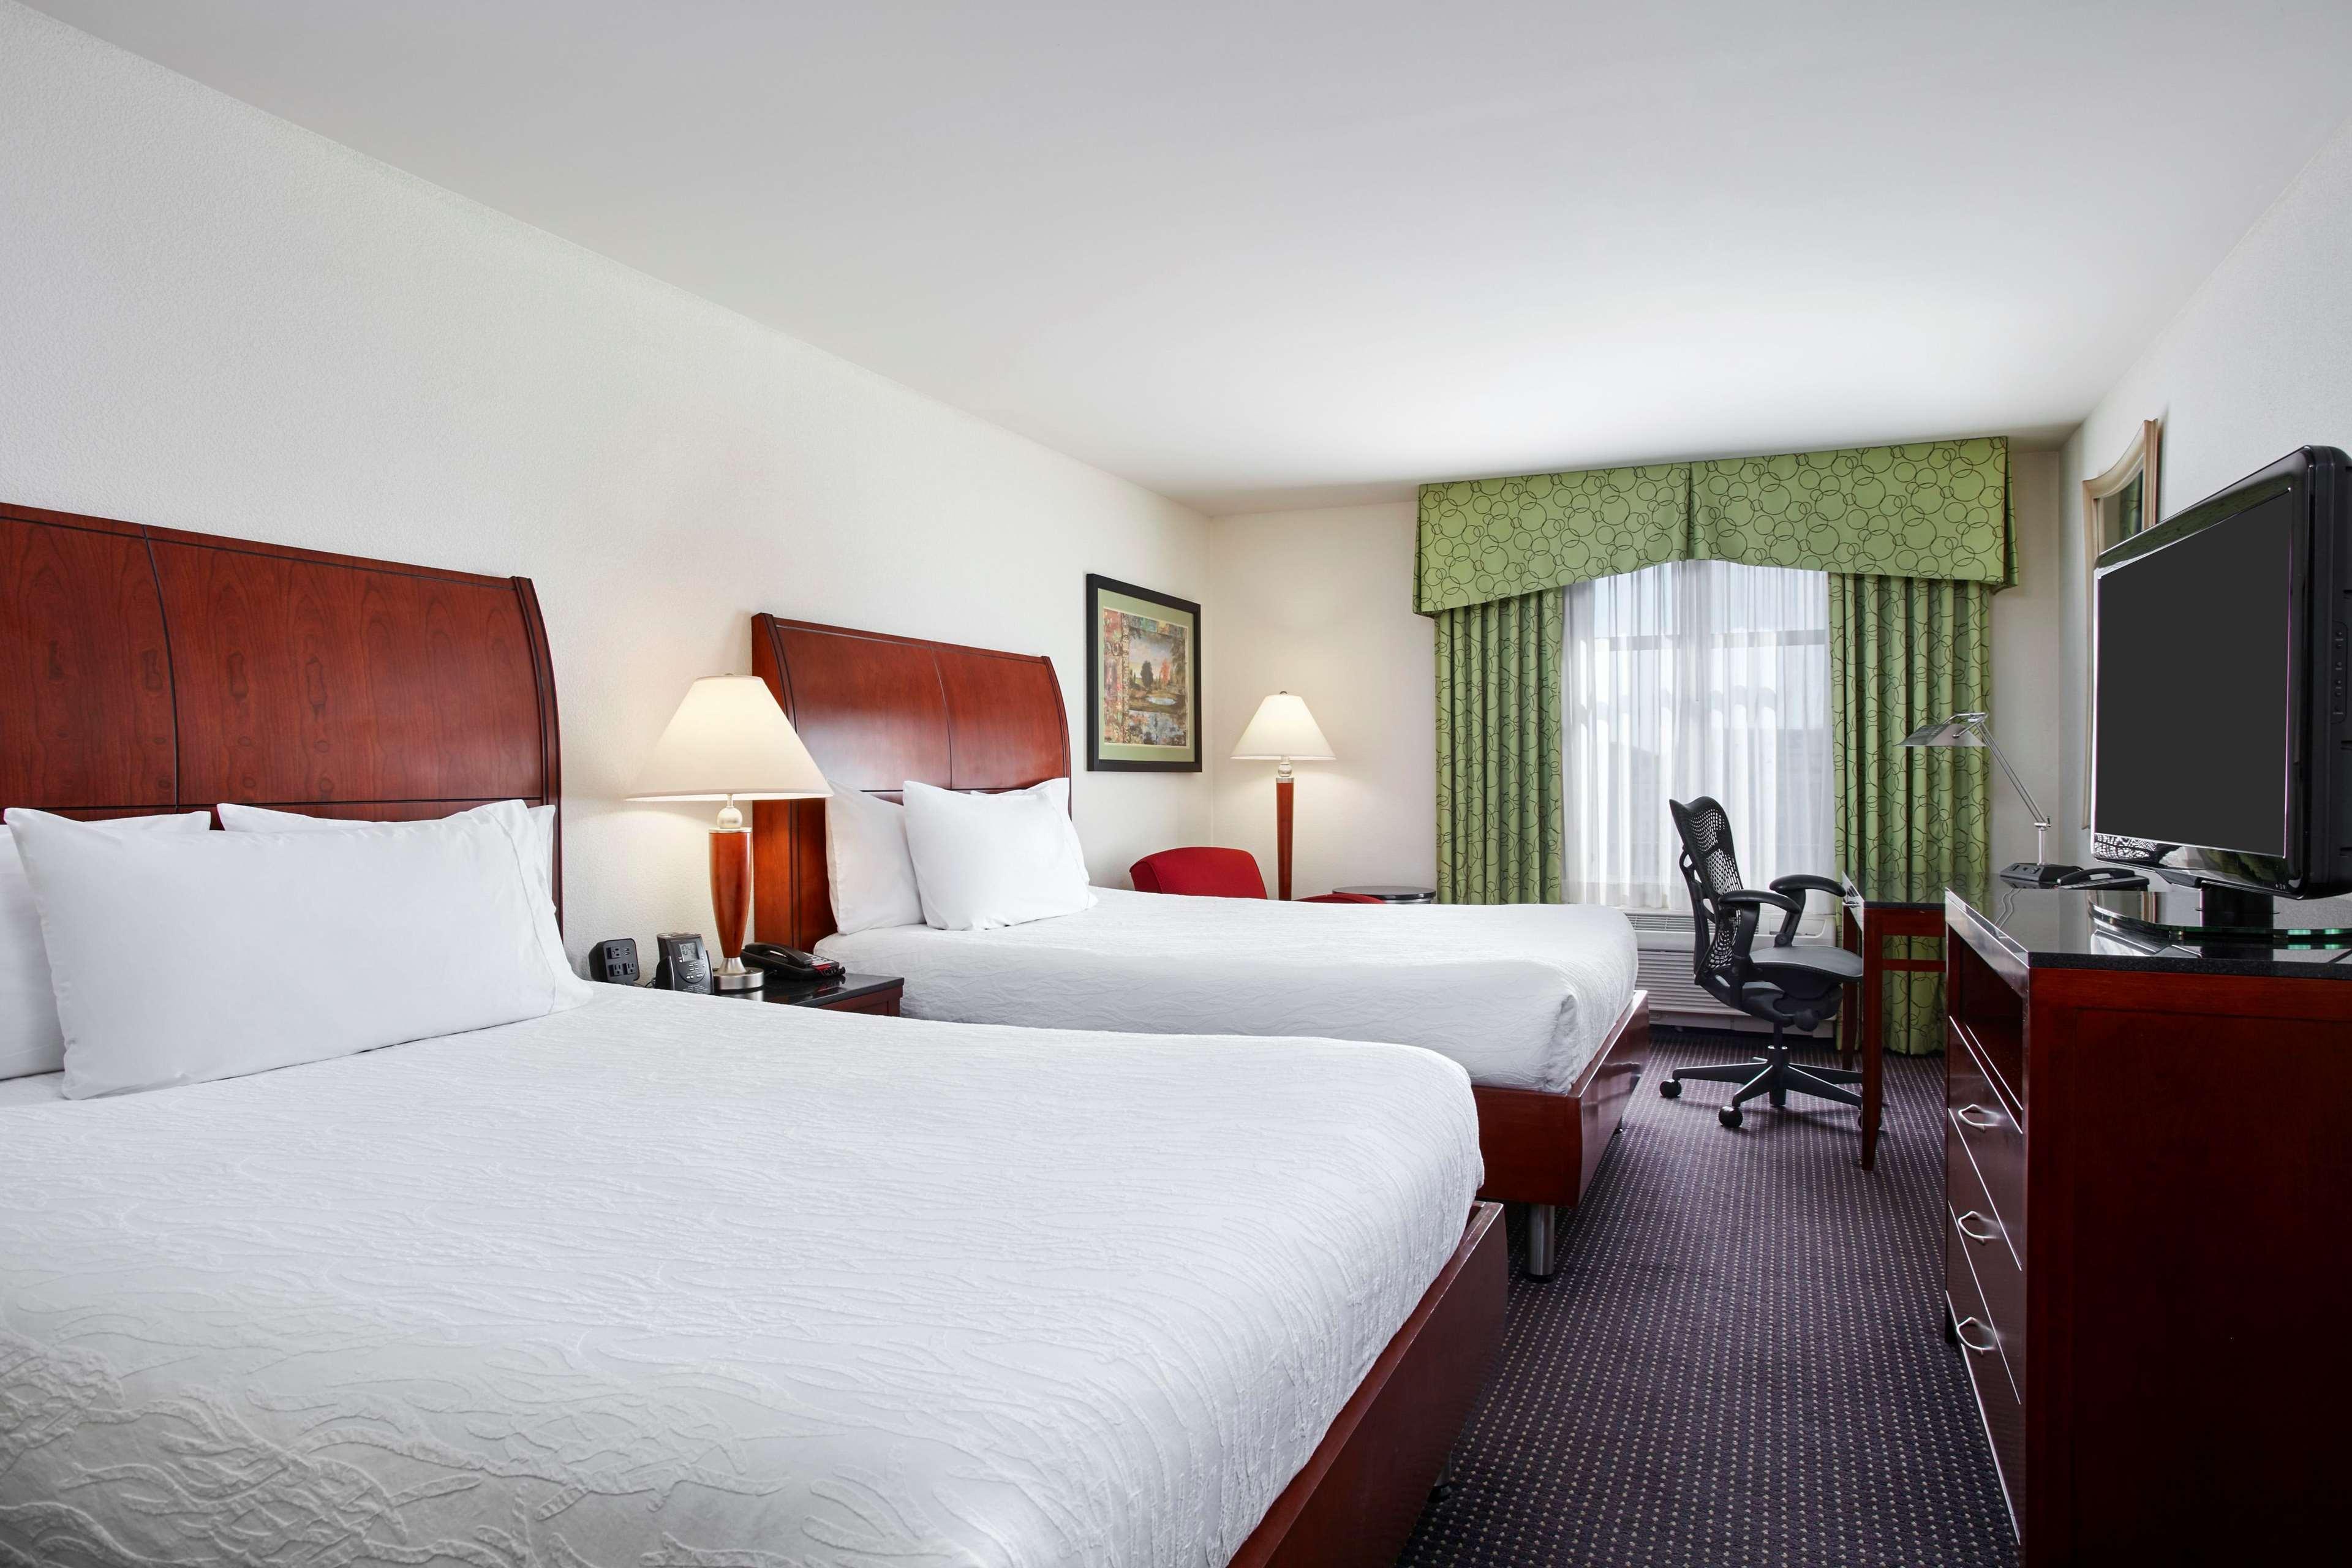 Hilton Garden Inn Rockville-Gaithersburg image 28